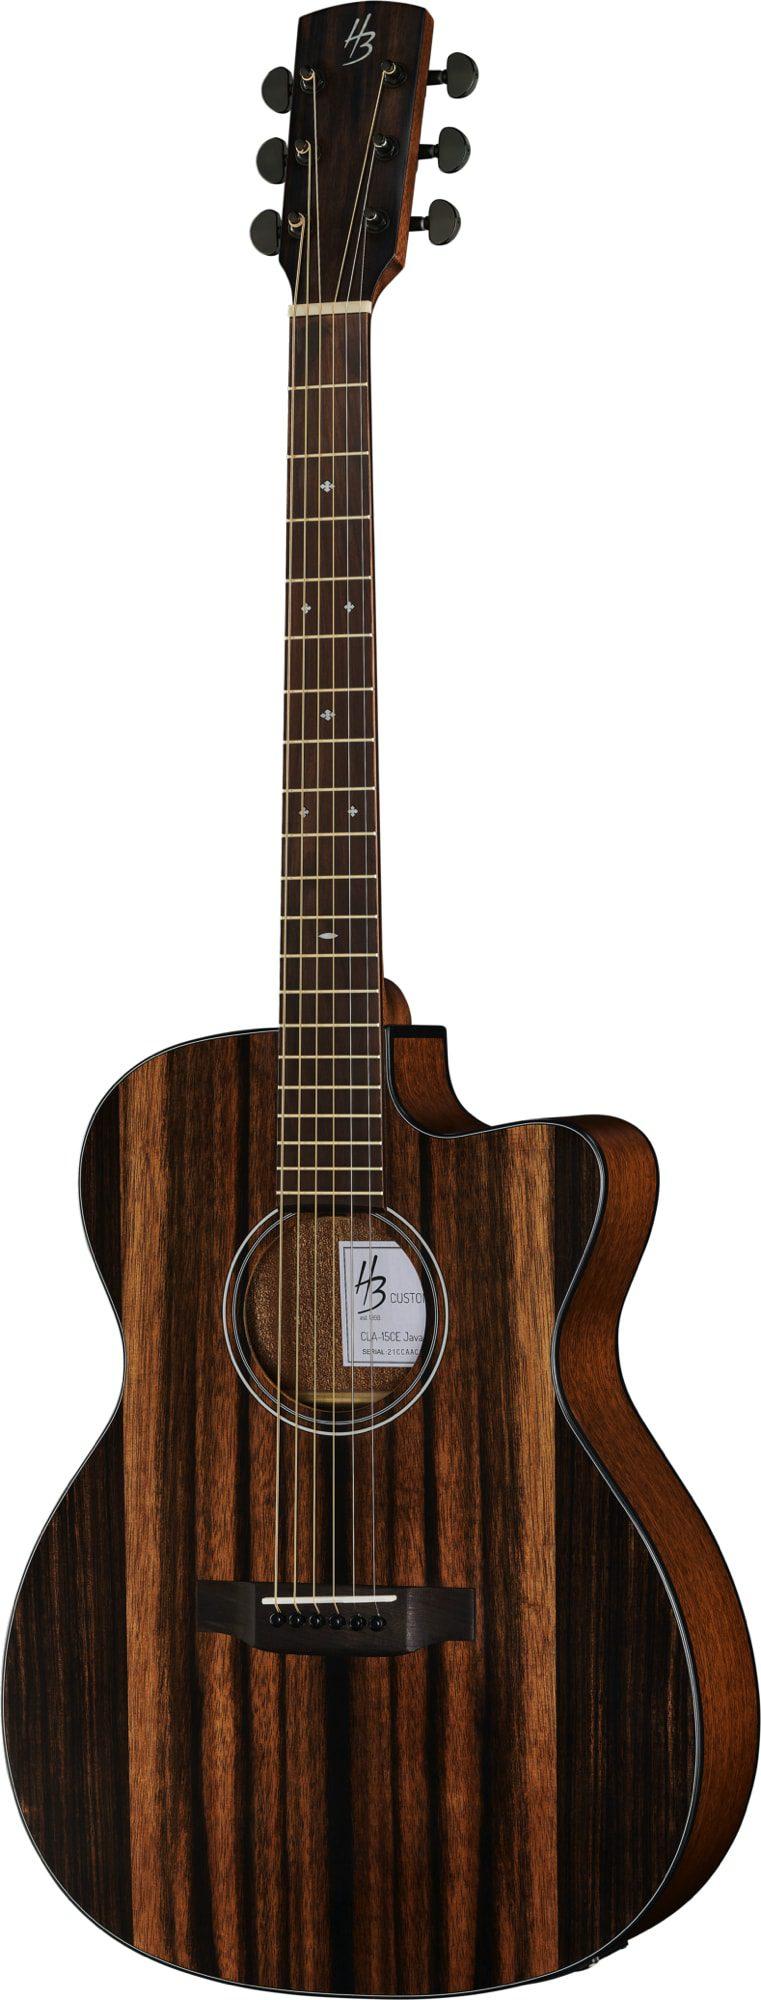 Harley Benton Exotic Wood Custom Line java Ebony